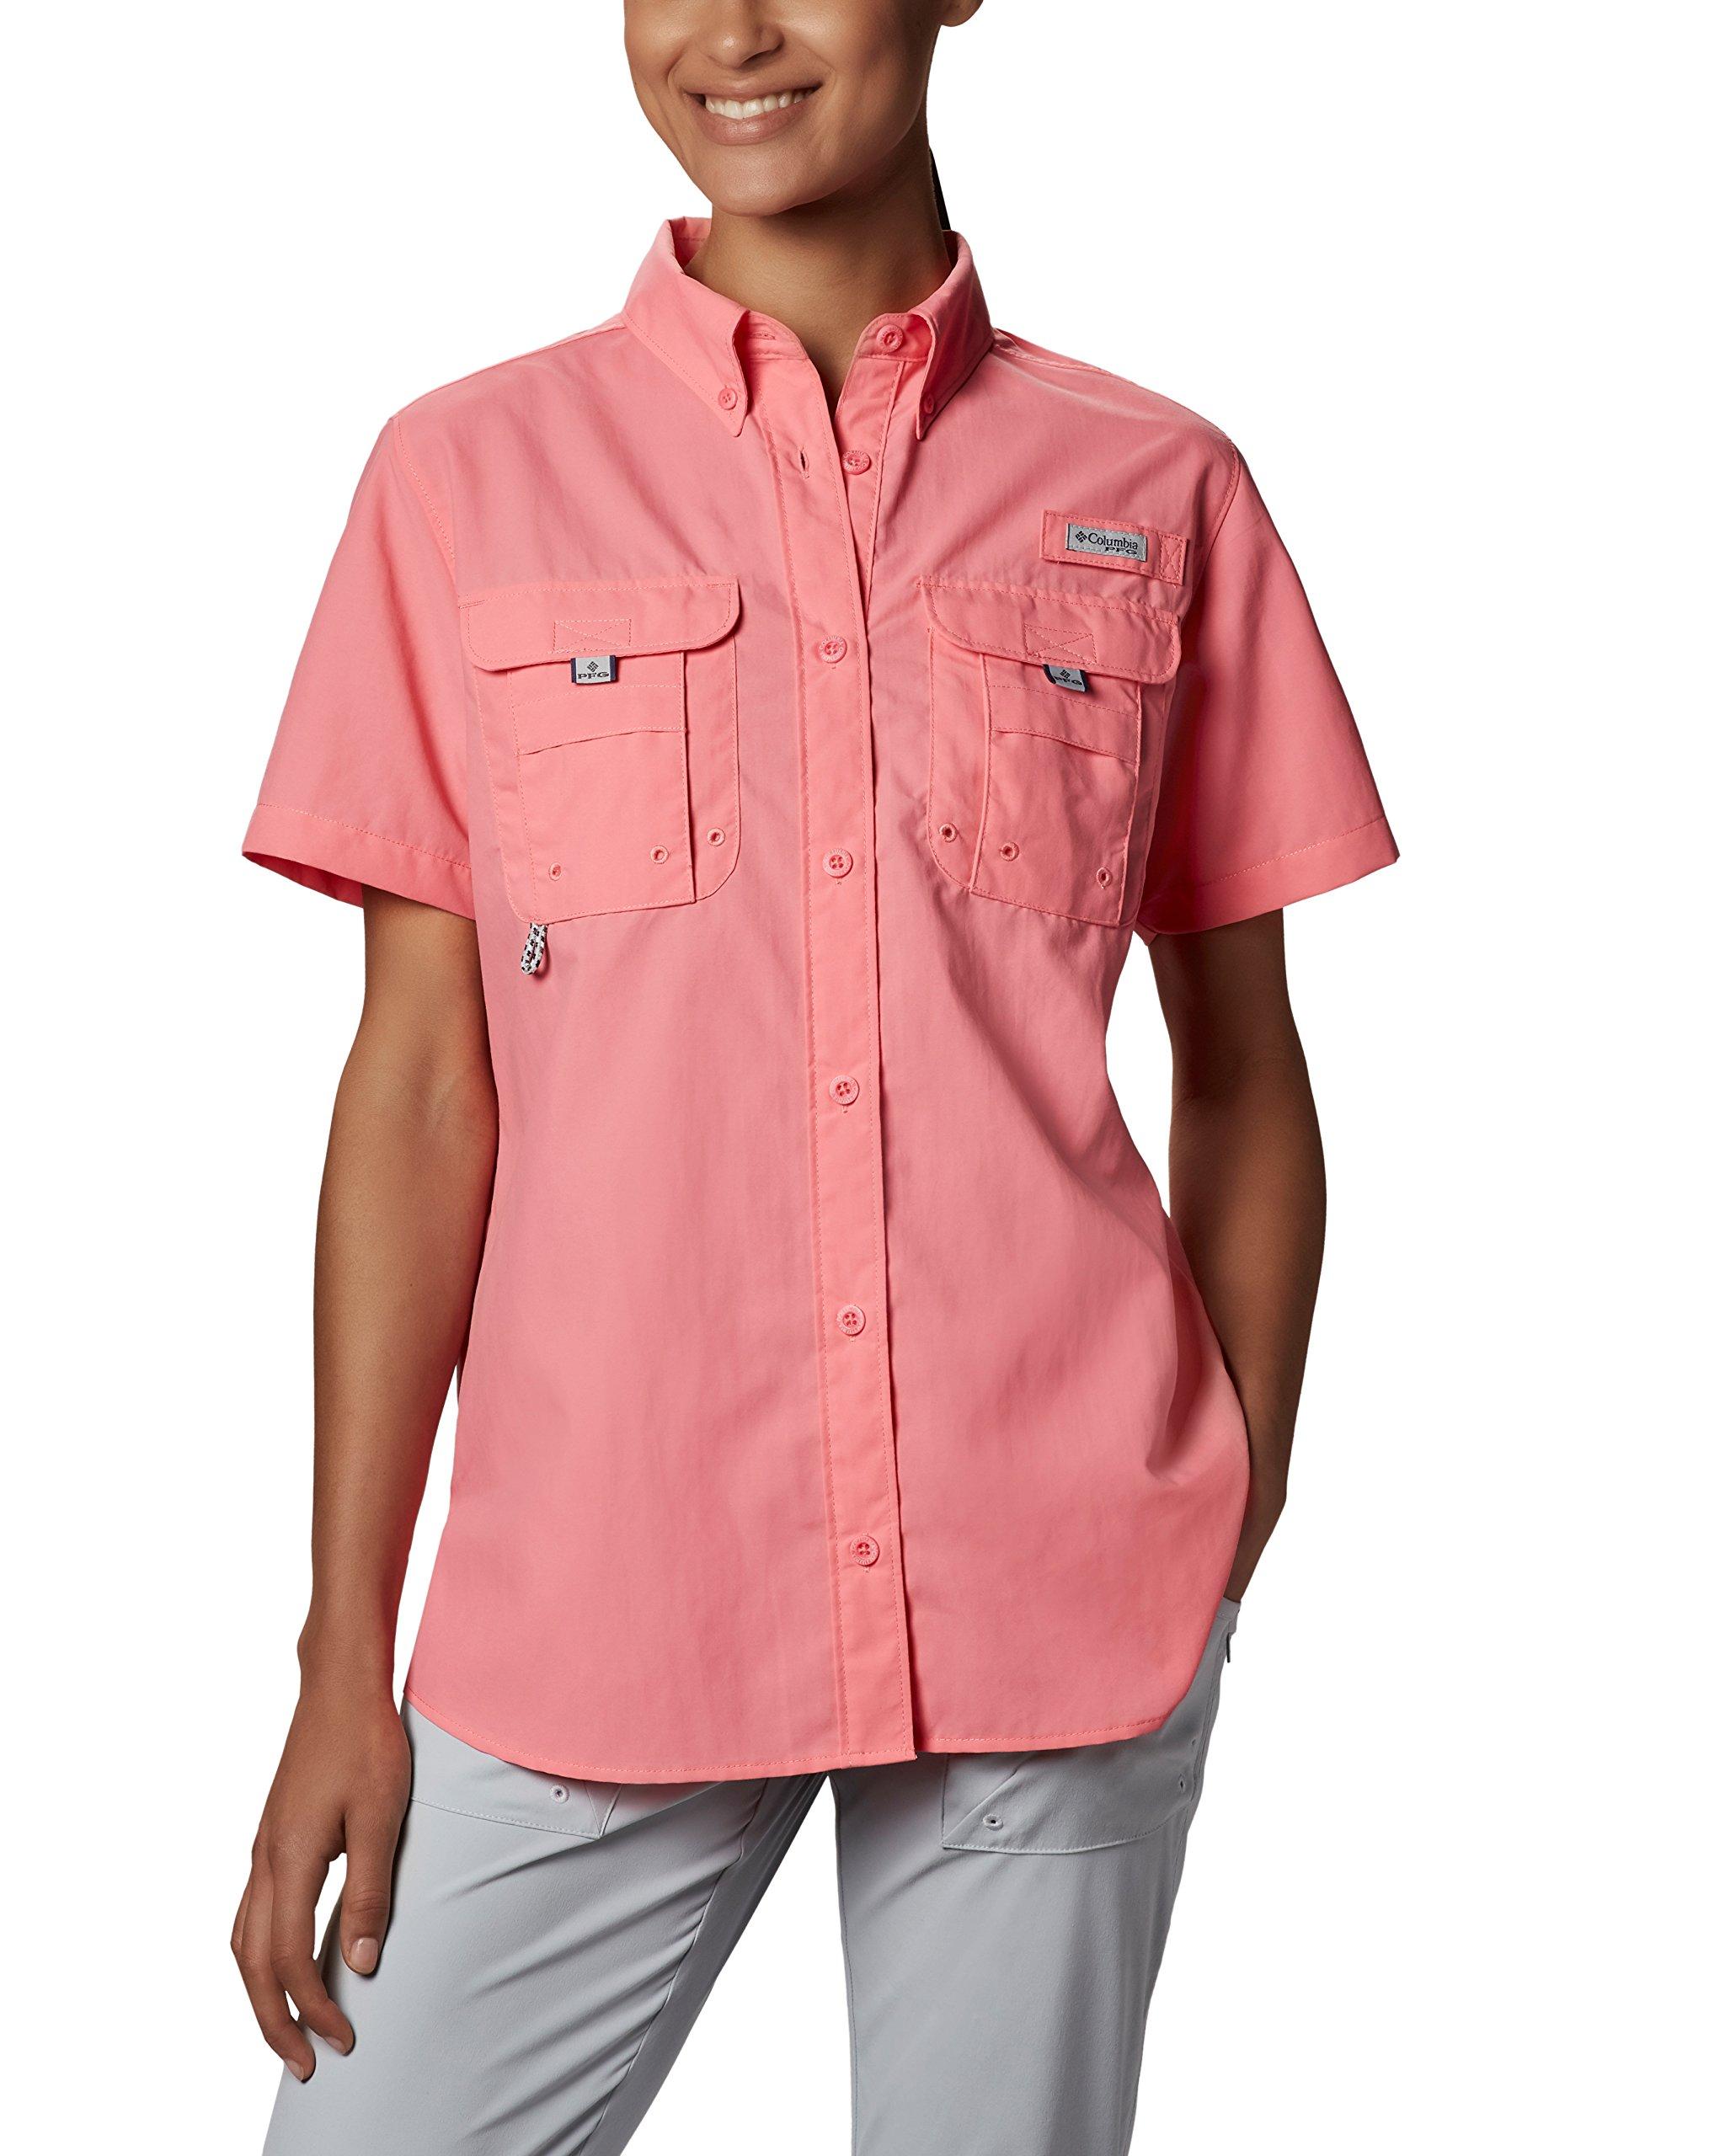 Columbia Women's Bahama Short Sleeve, Lollipop, X-Large